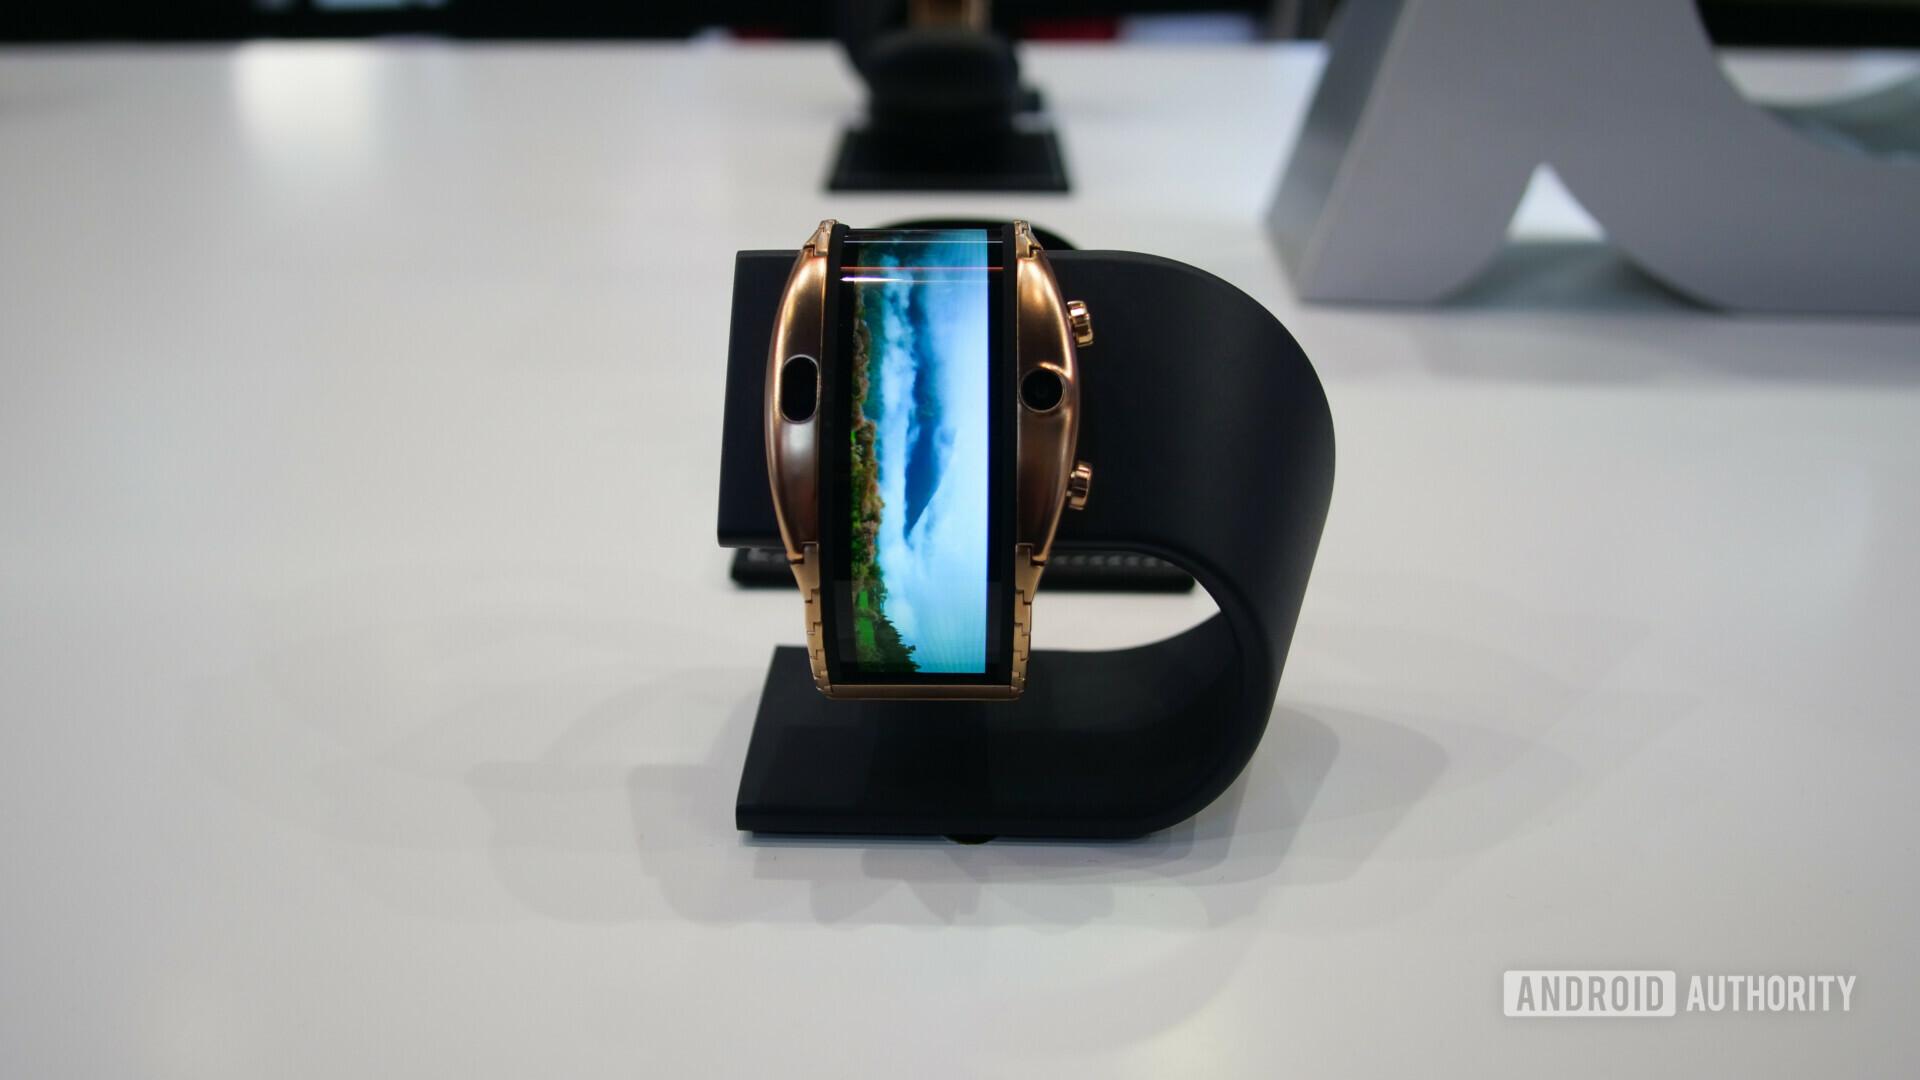 nubia alpha flexible display smartwatch at mwc 2019